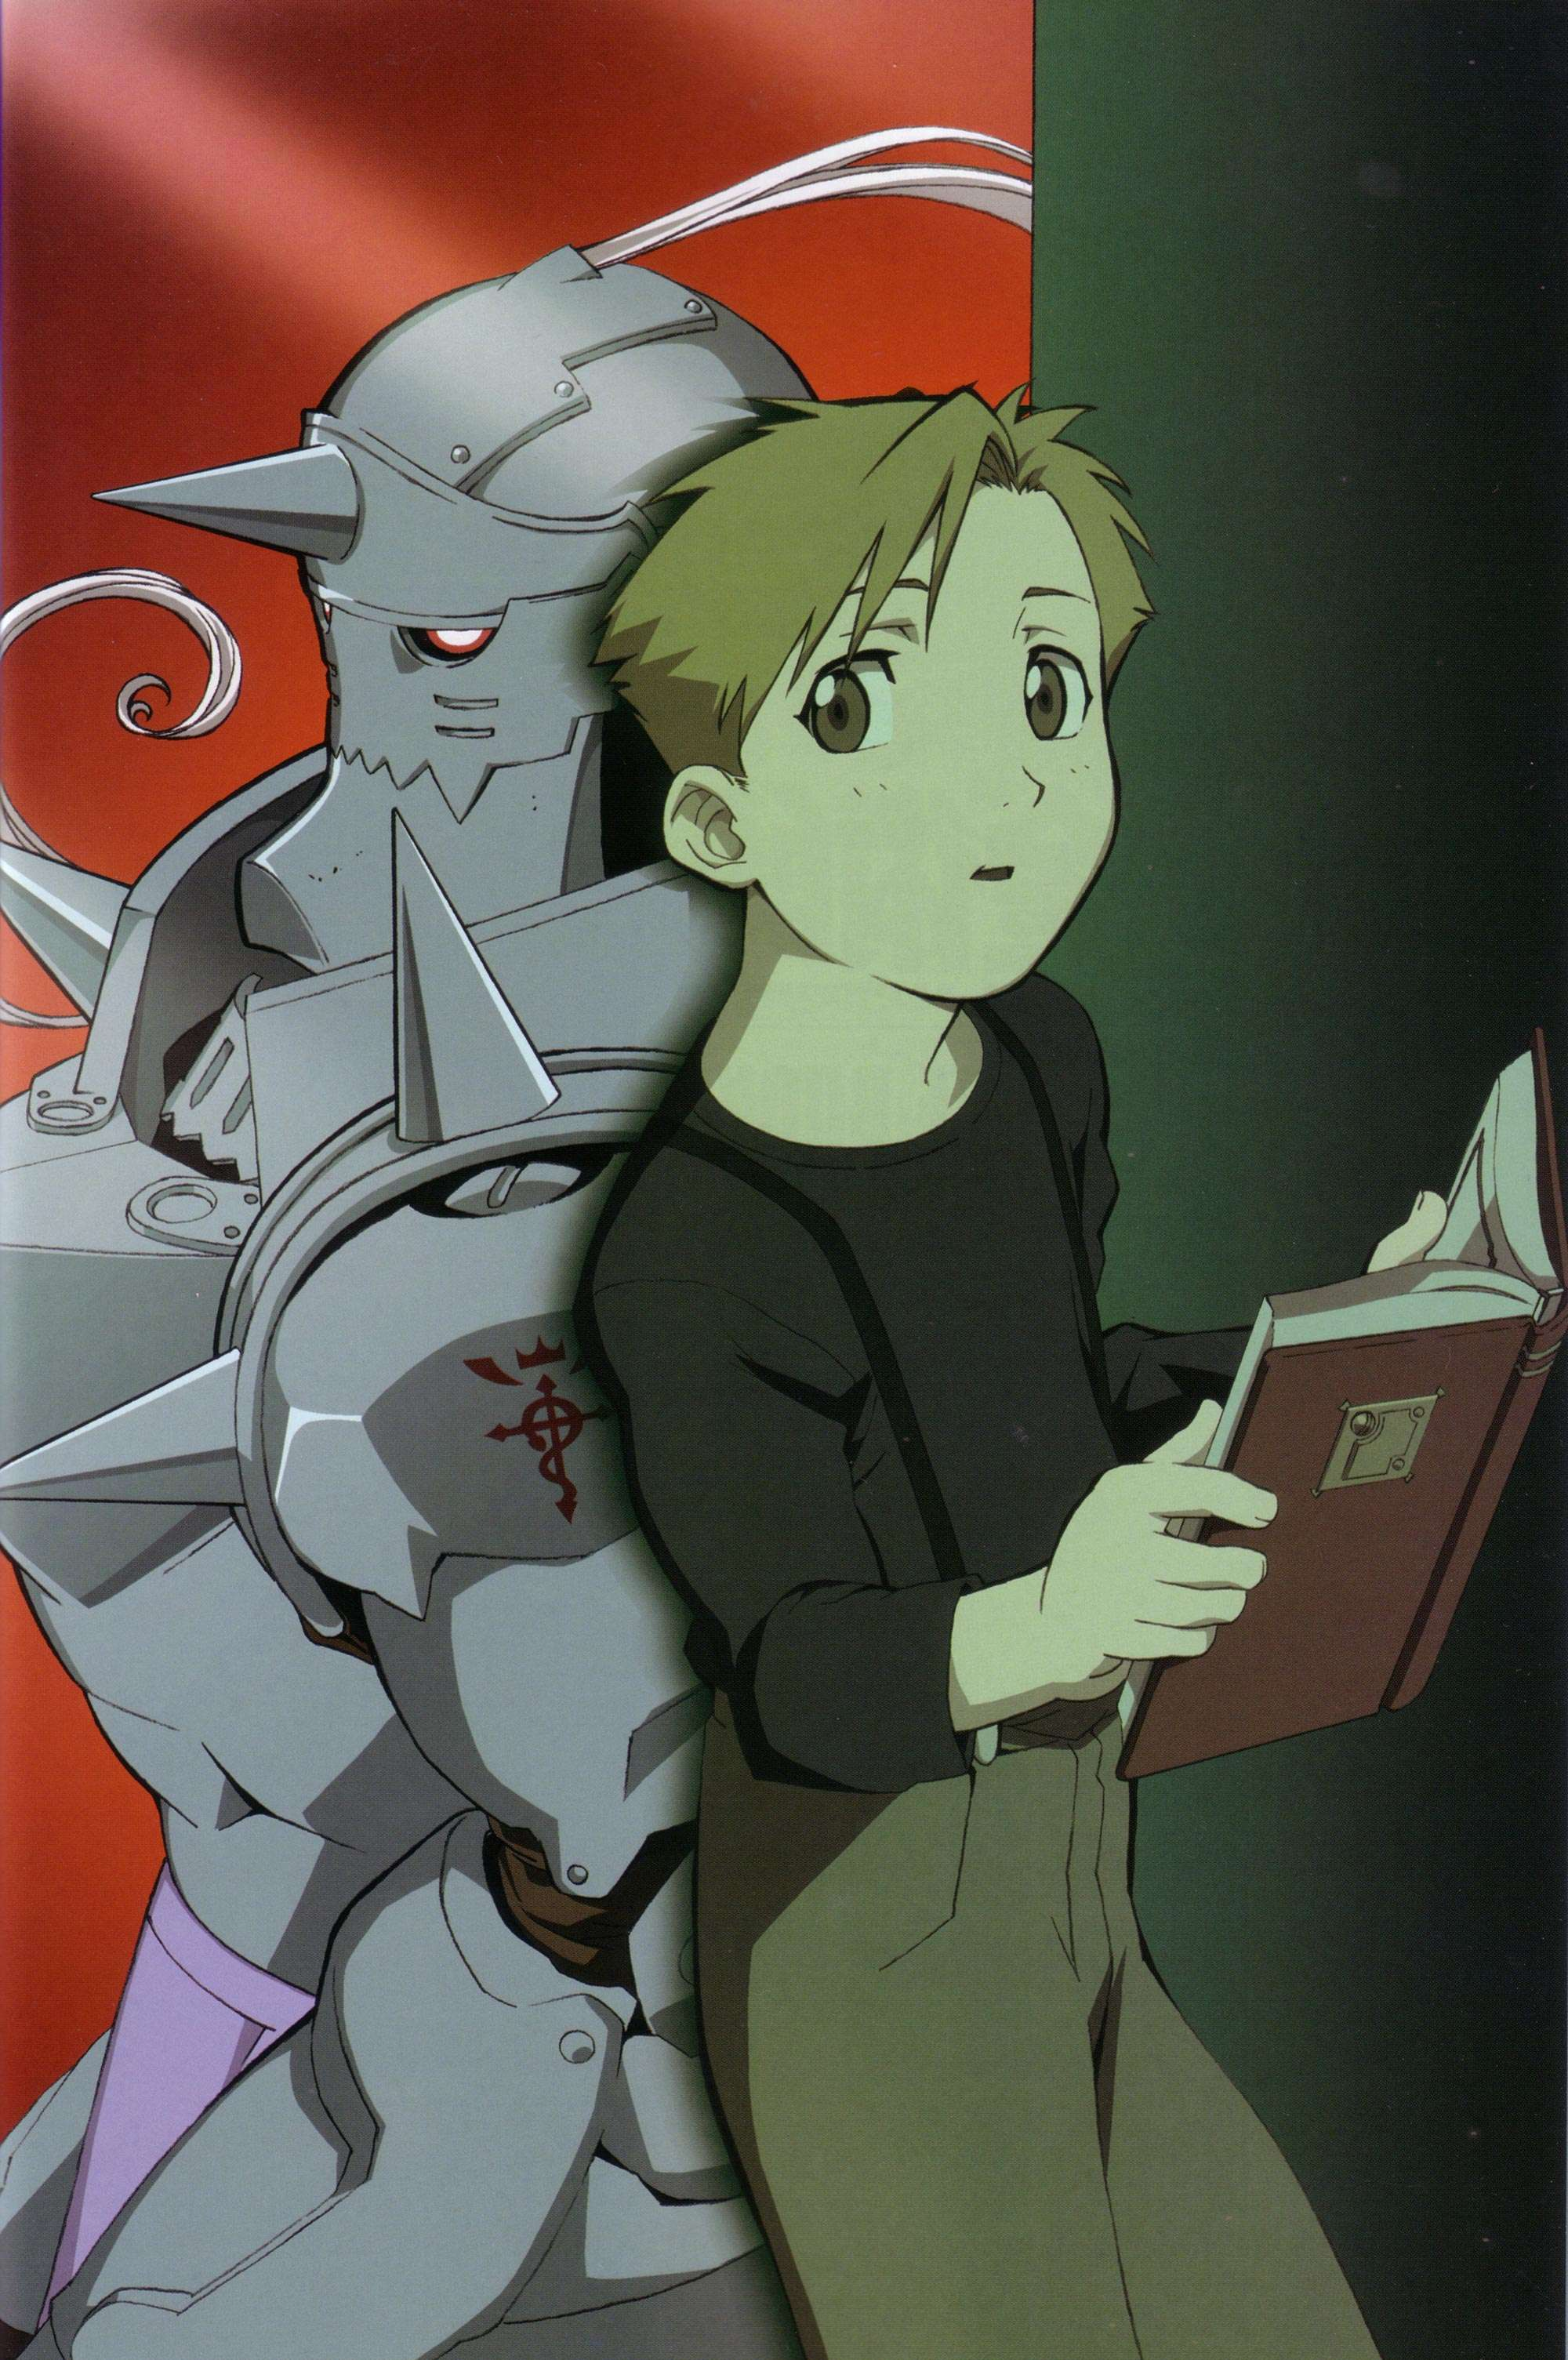 Alphonse Elric - Fullmetal Alchemist   page 4 of 7 ...